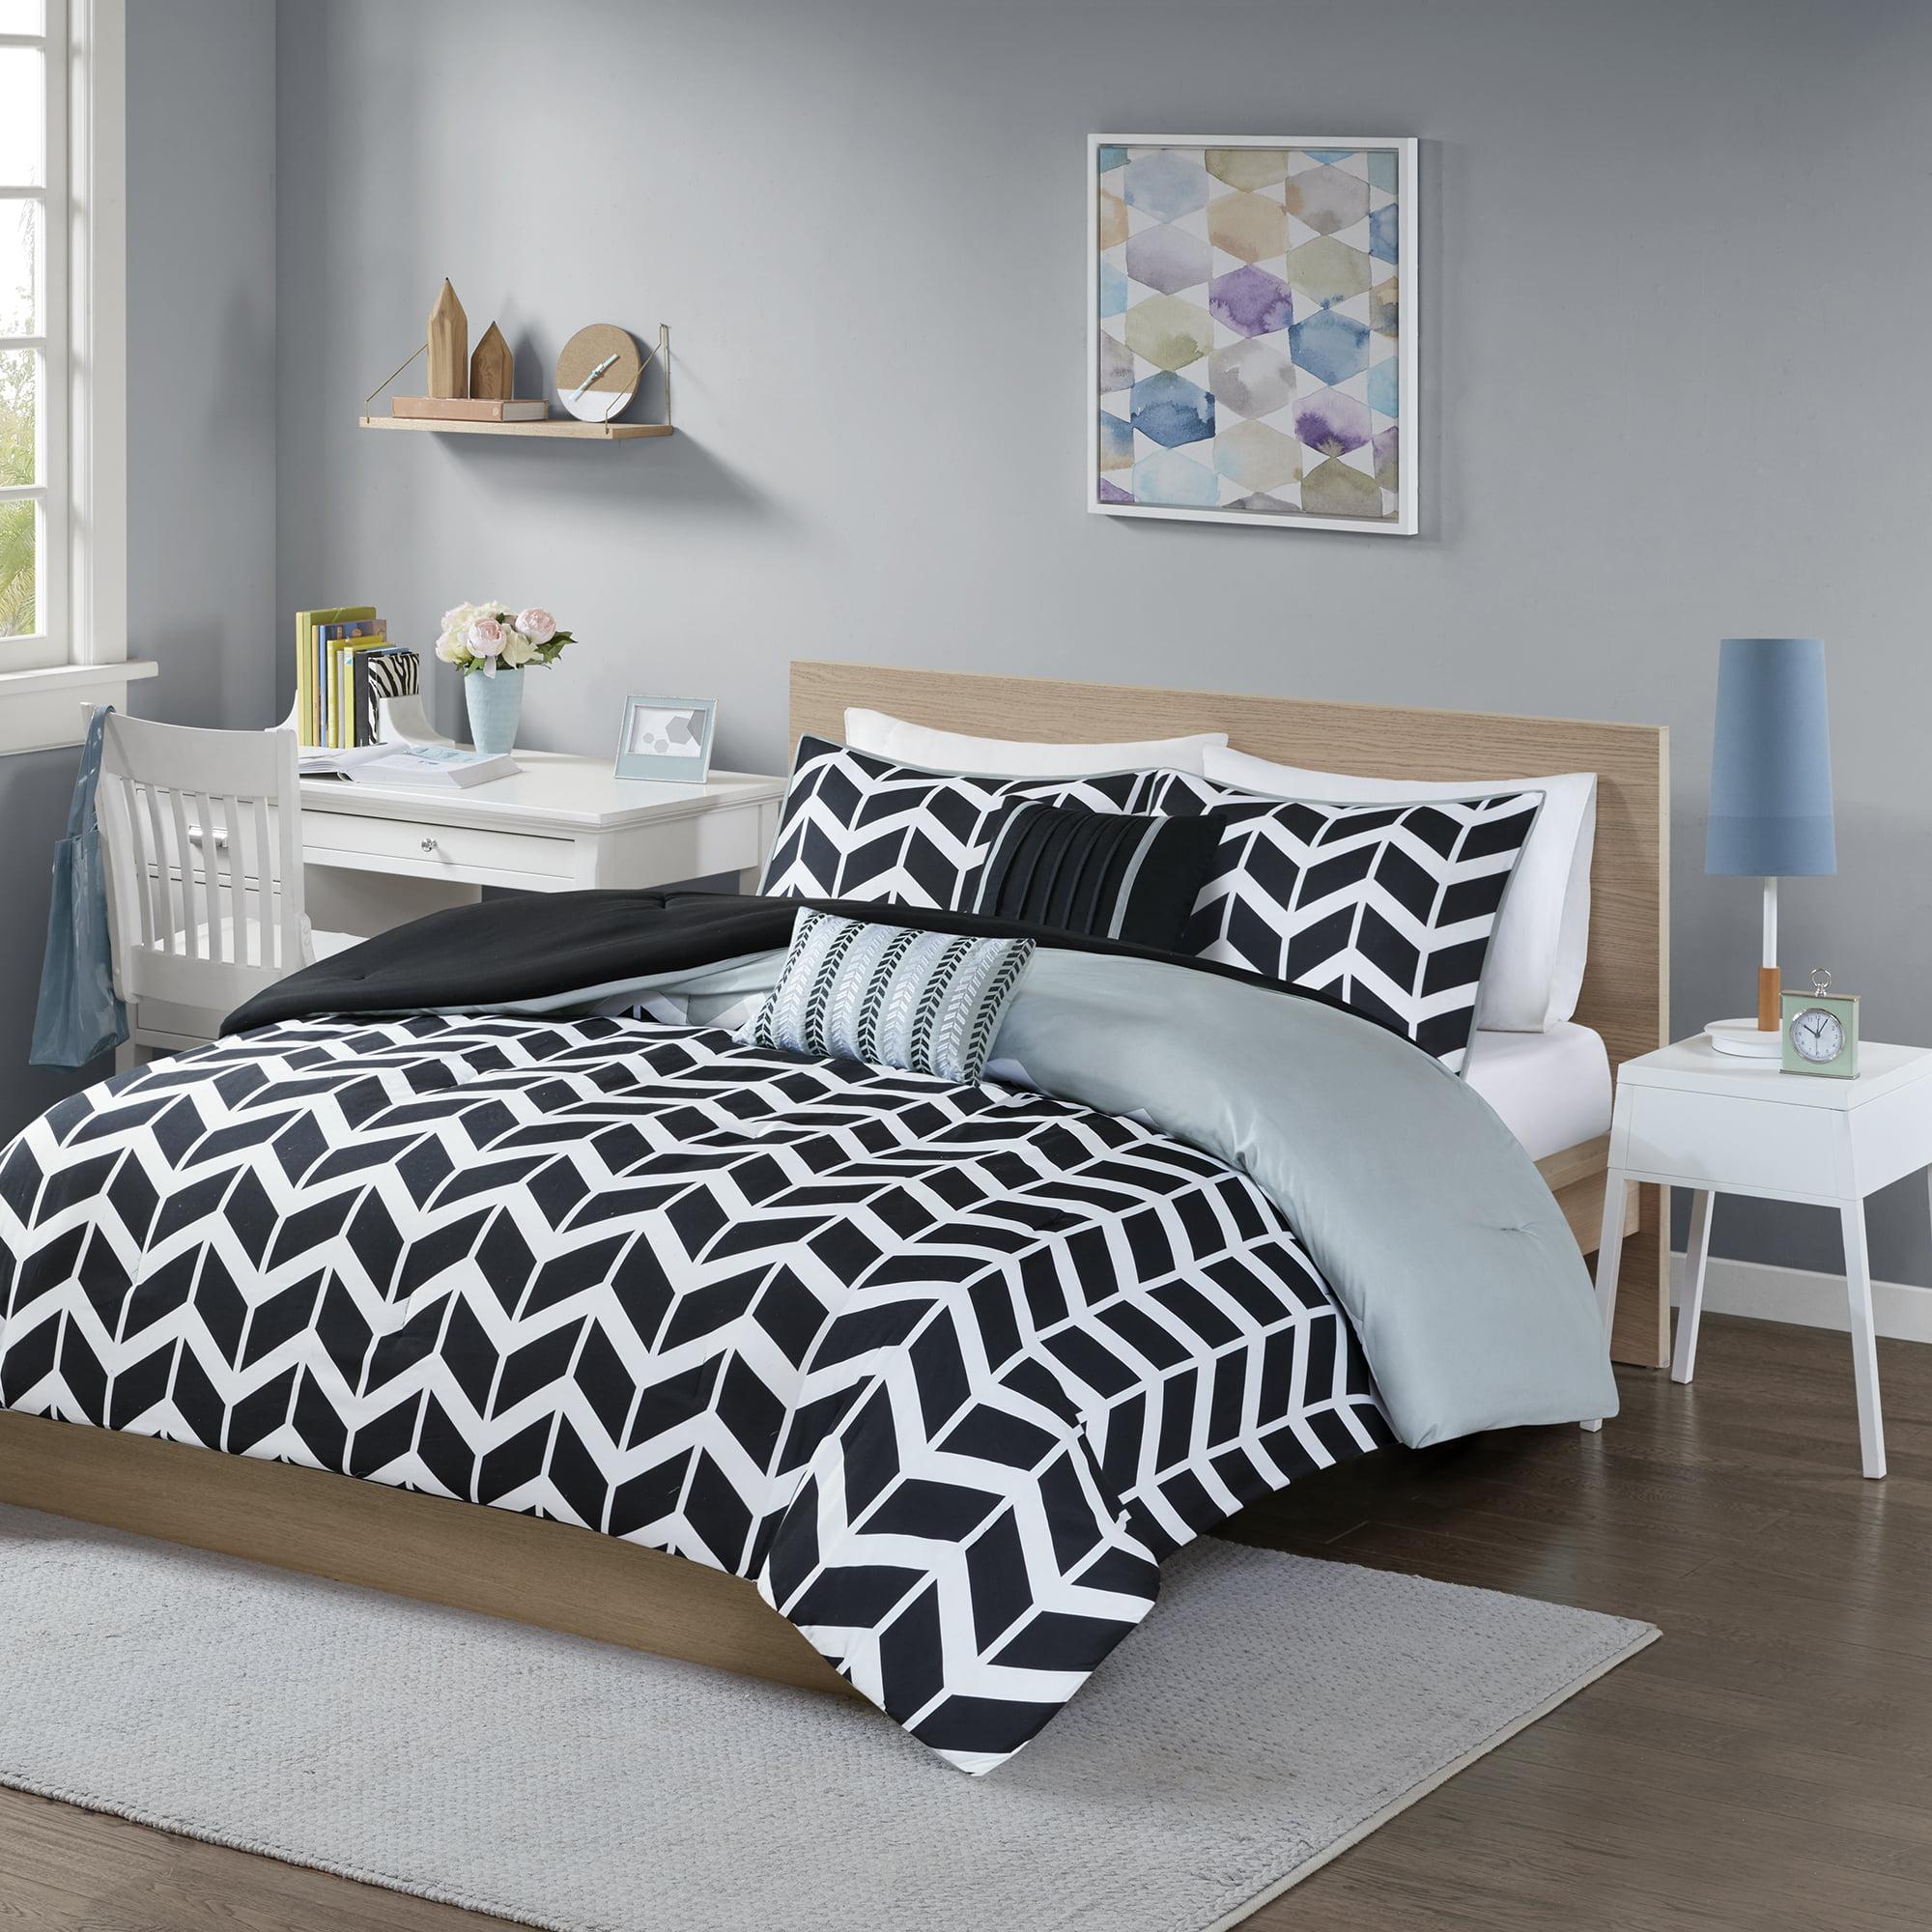 Double Brushed Ultra Microfiber Luxury Bedding Set Xl Twin Sheet Set Gray Chevron